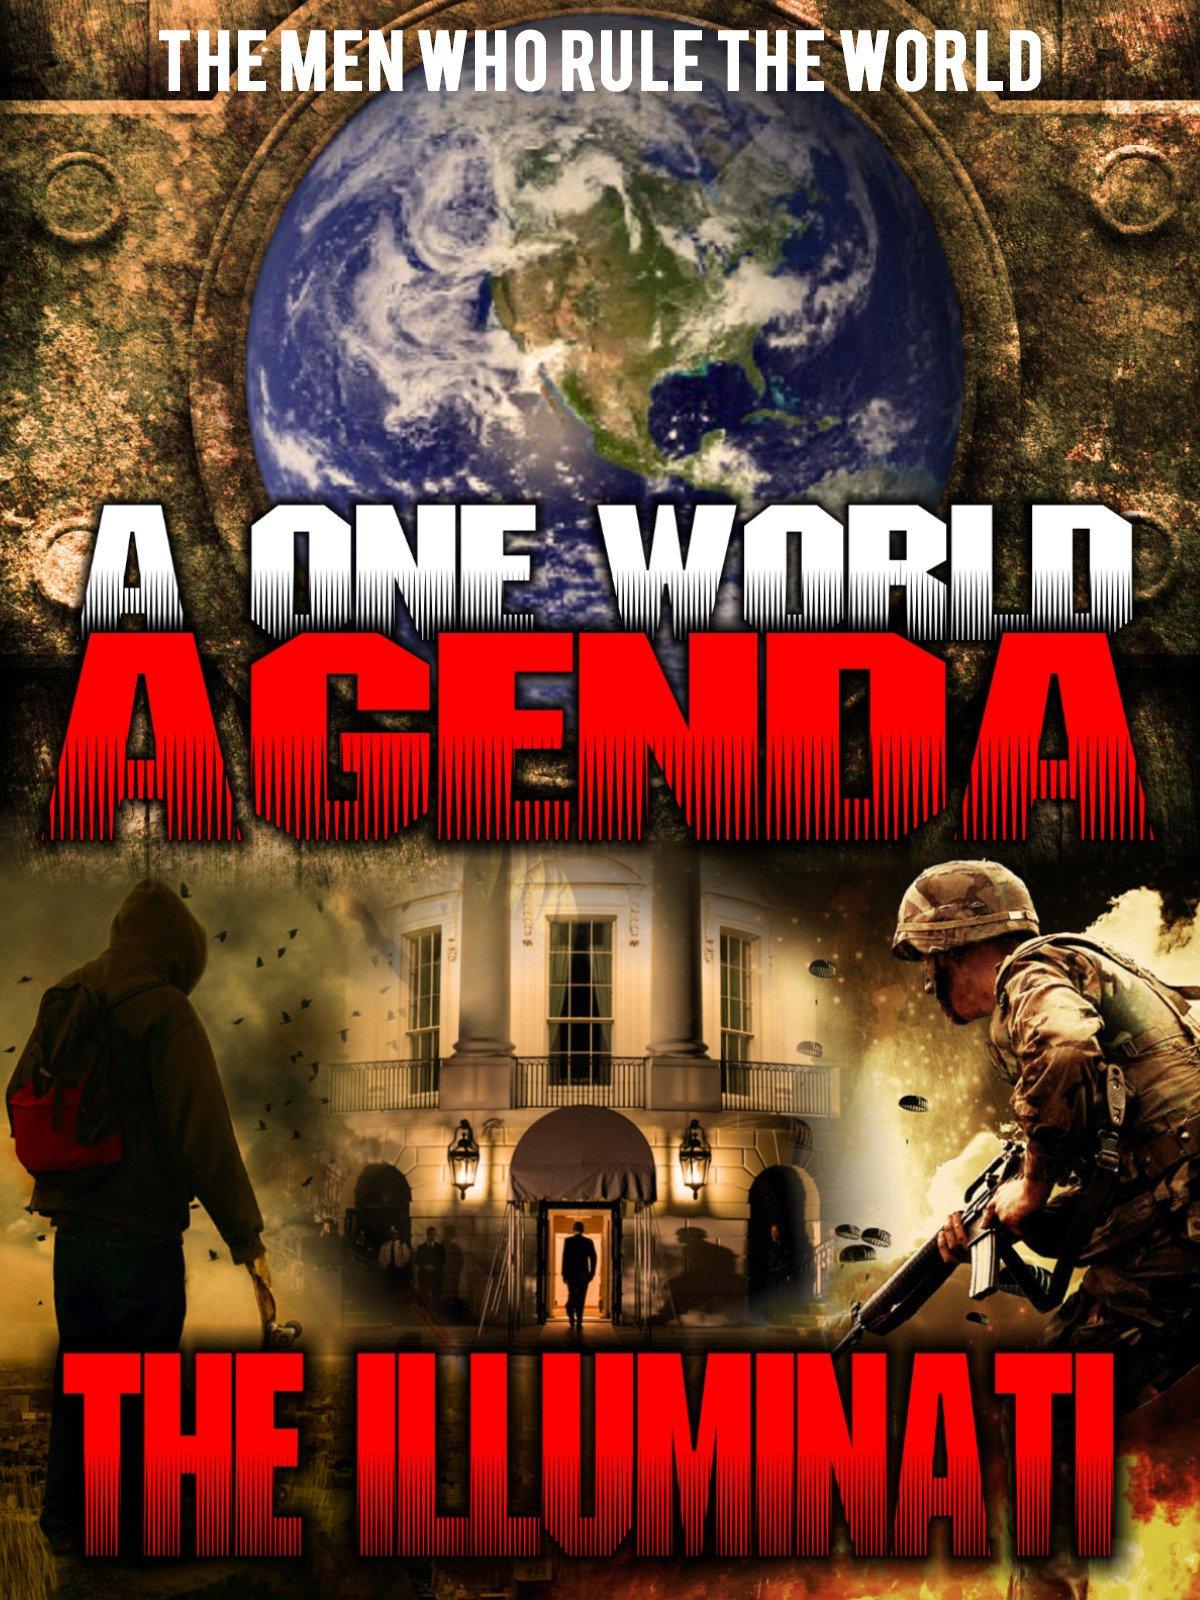 A One World Agenda